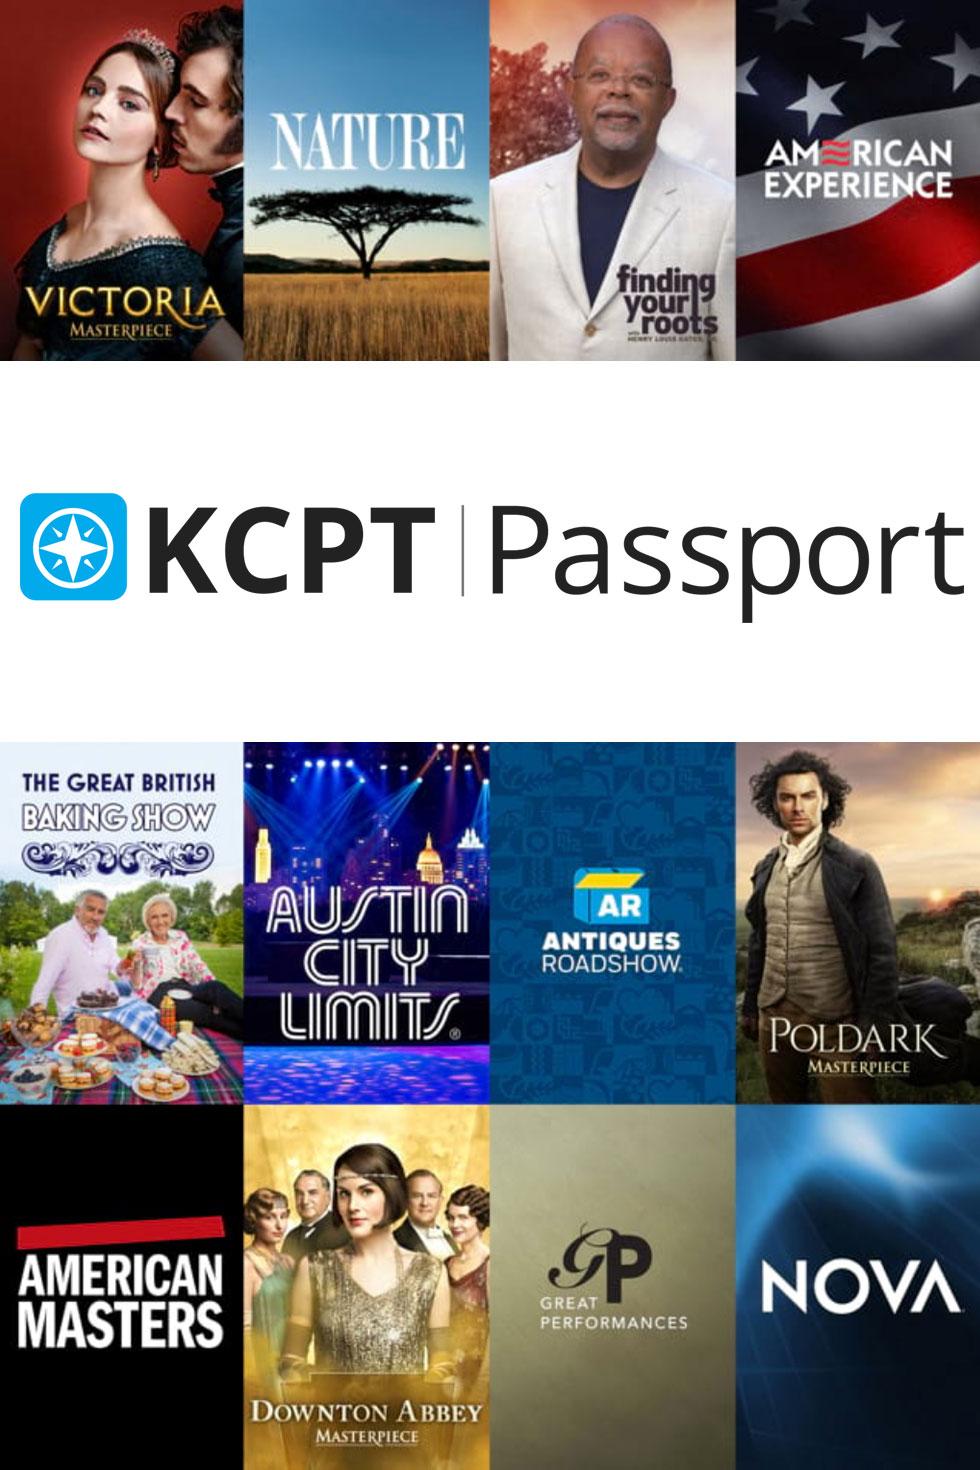 KCPT Passport